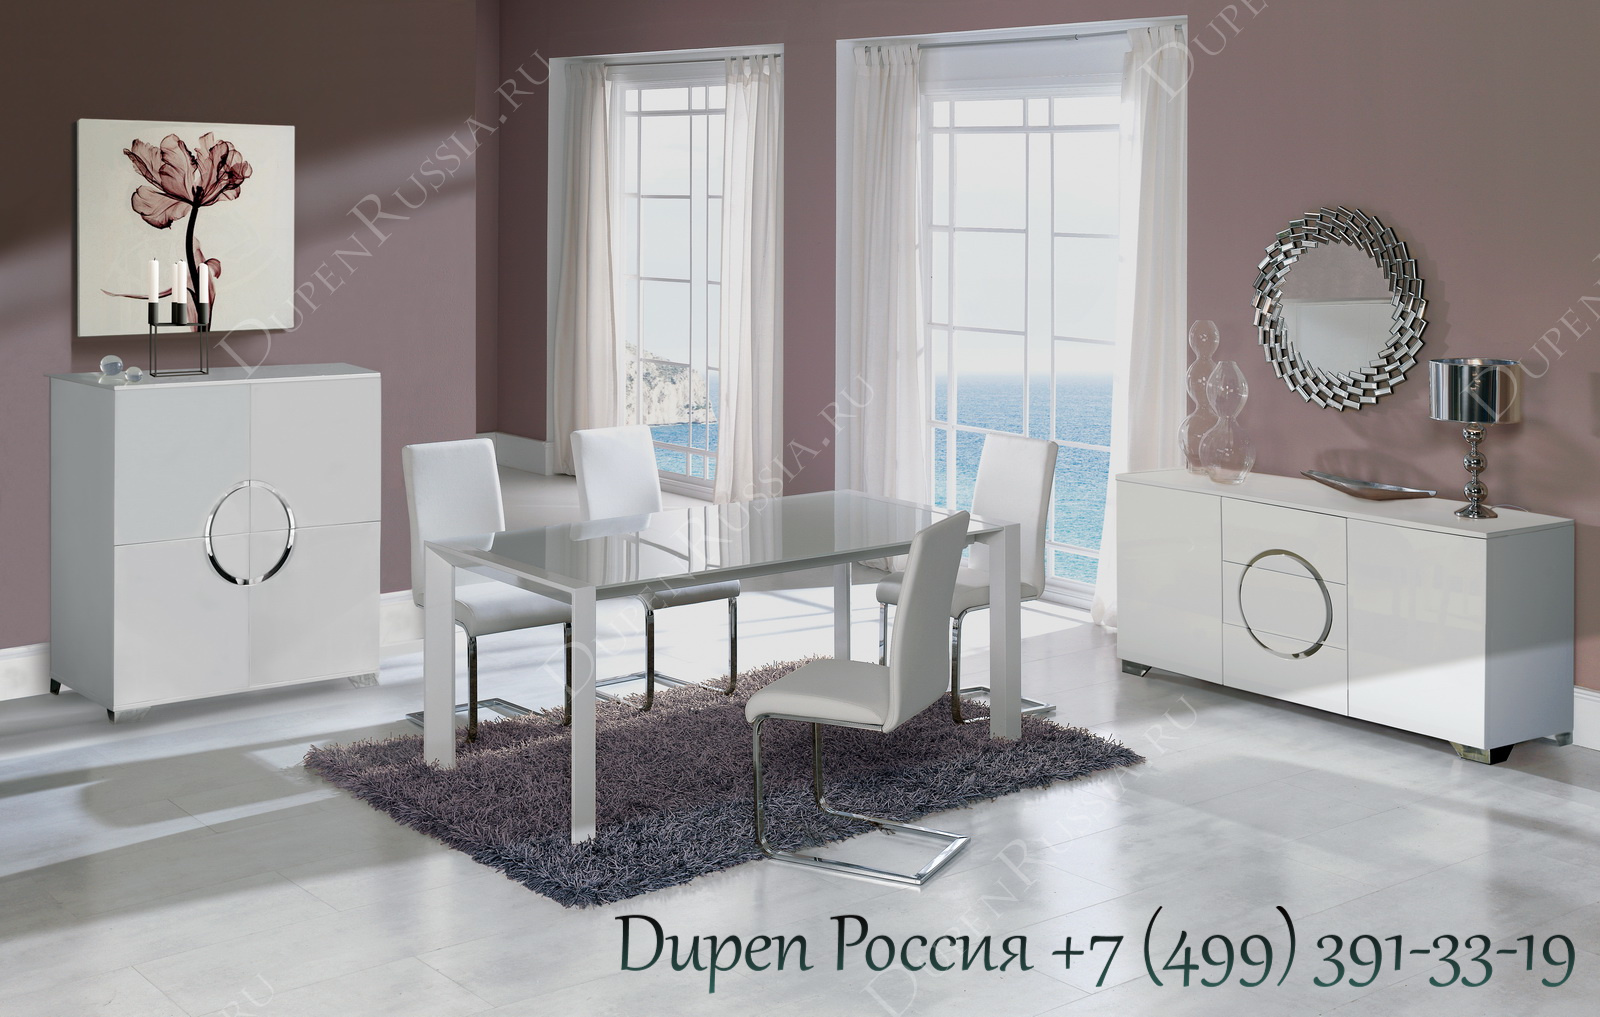 Стол DUPEN DT-11, Стул DUPEN DC-100, Буфет DUPEN W-743, Комод DUPEN W-744